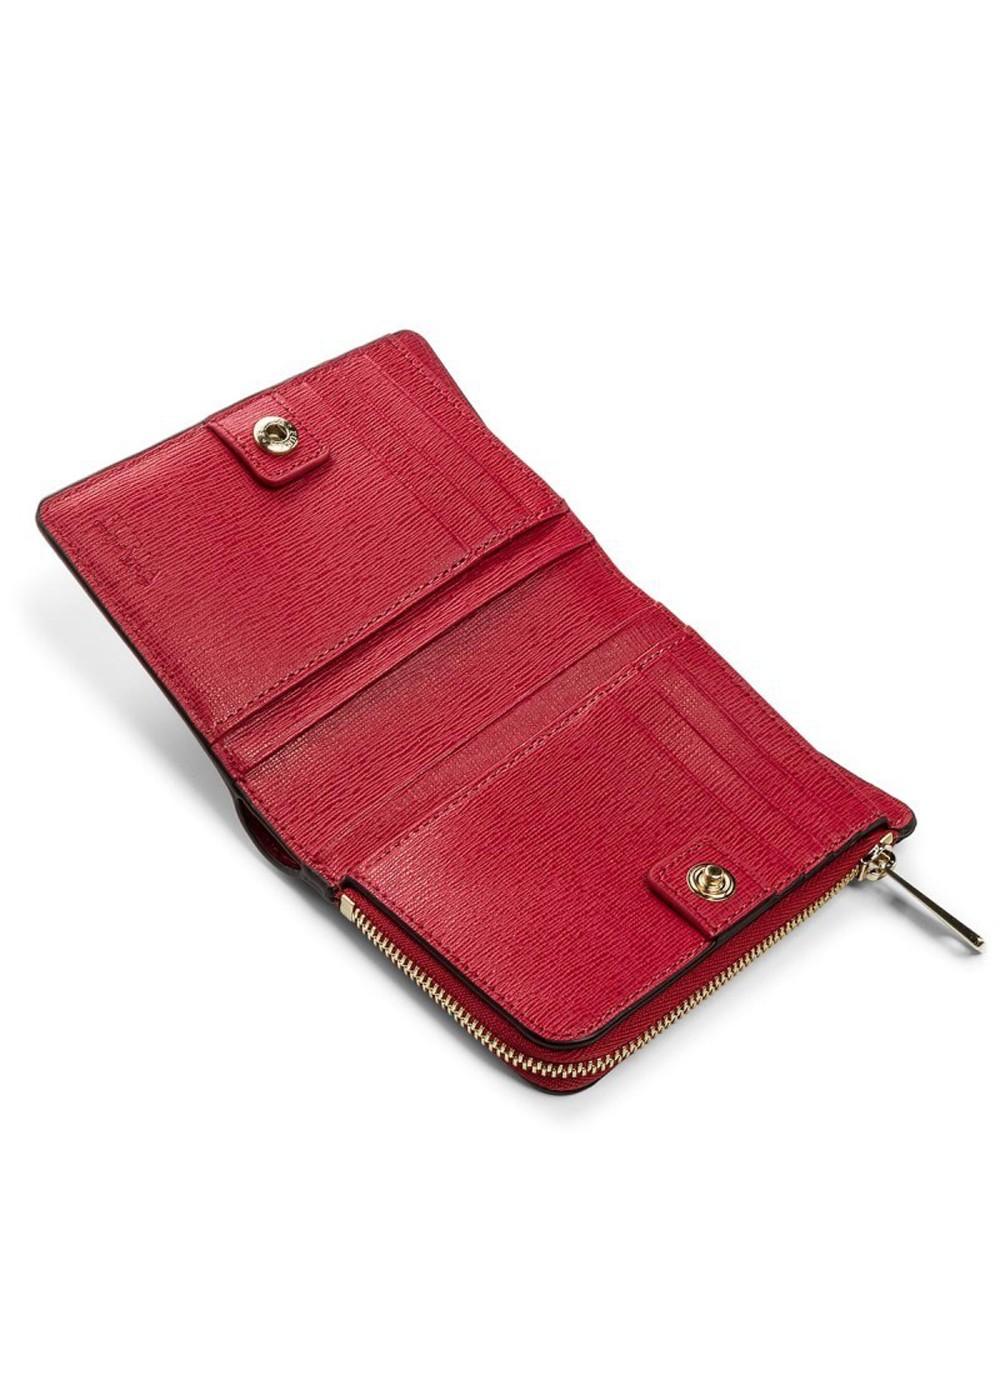 aaac30c11497 最大57%OFF】【2/12入荷】フルラ 二つ折り財布|レッド|レディース財布 ...